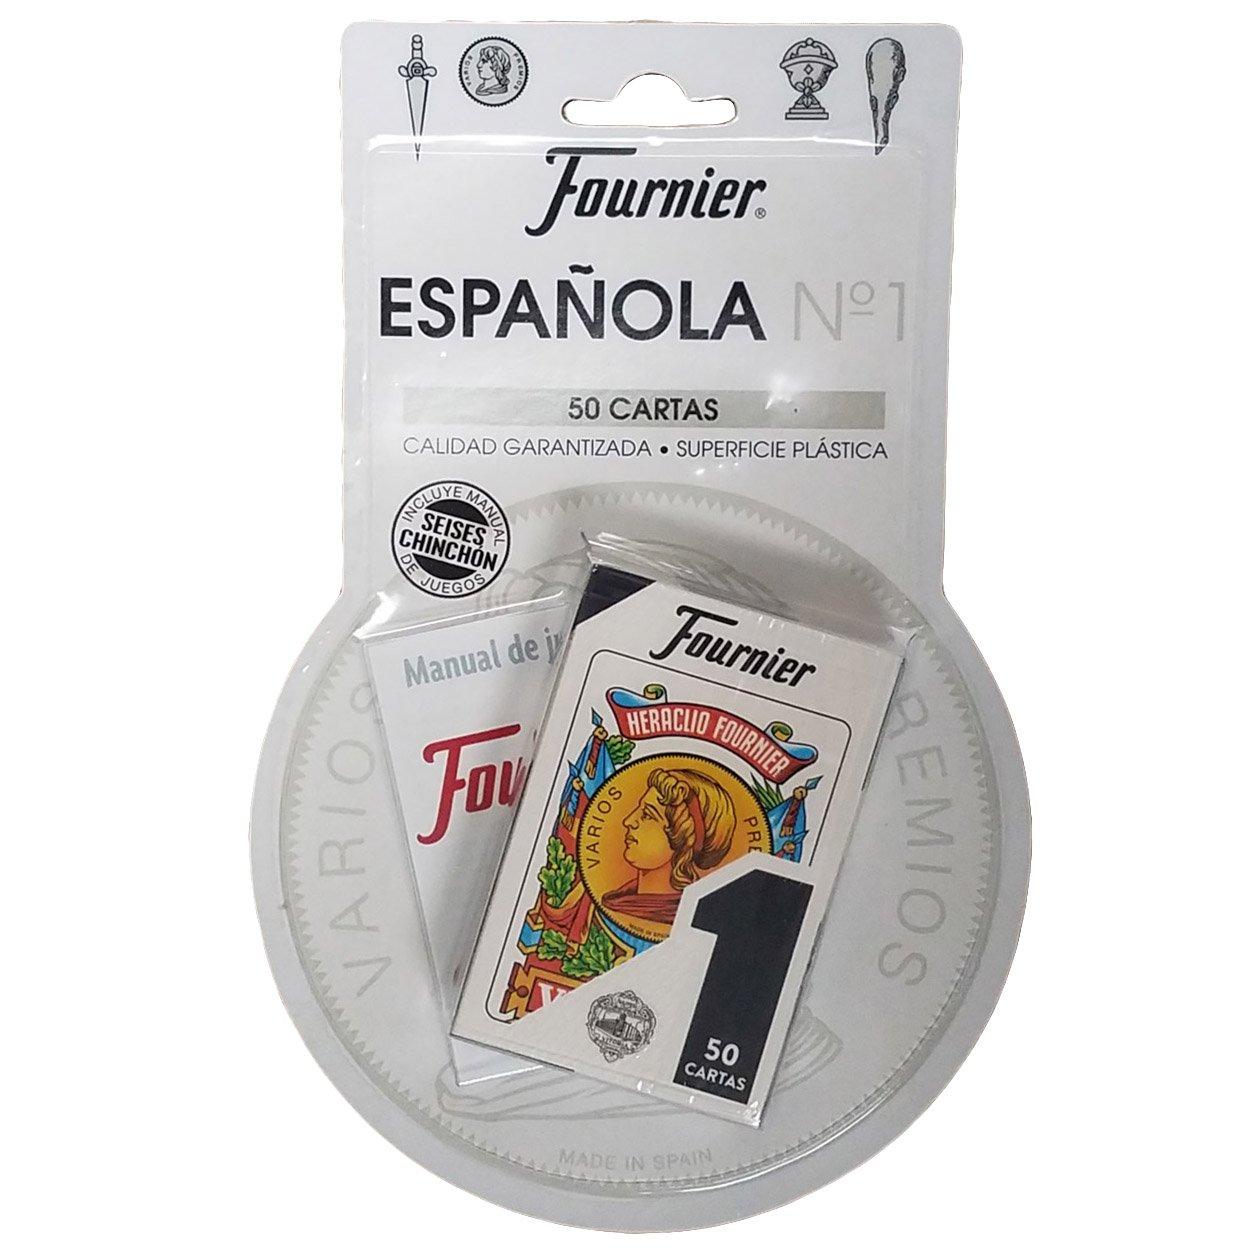 Set of 50 Fournier Spanish Playing Cards Tuck Case SeiSes - Chinchon Instructions - Baraja Española Instrucciones